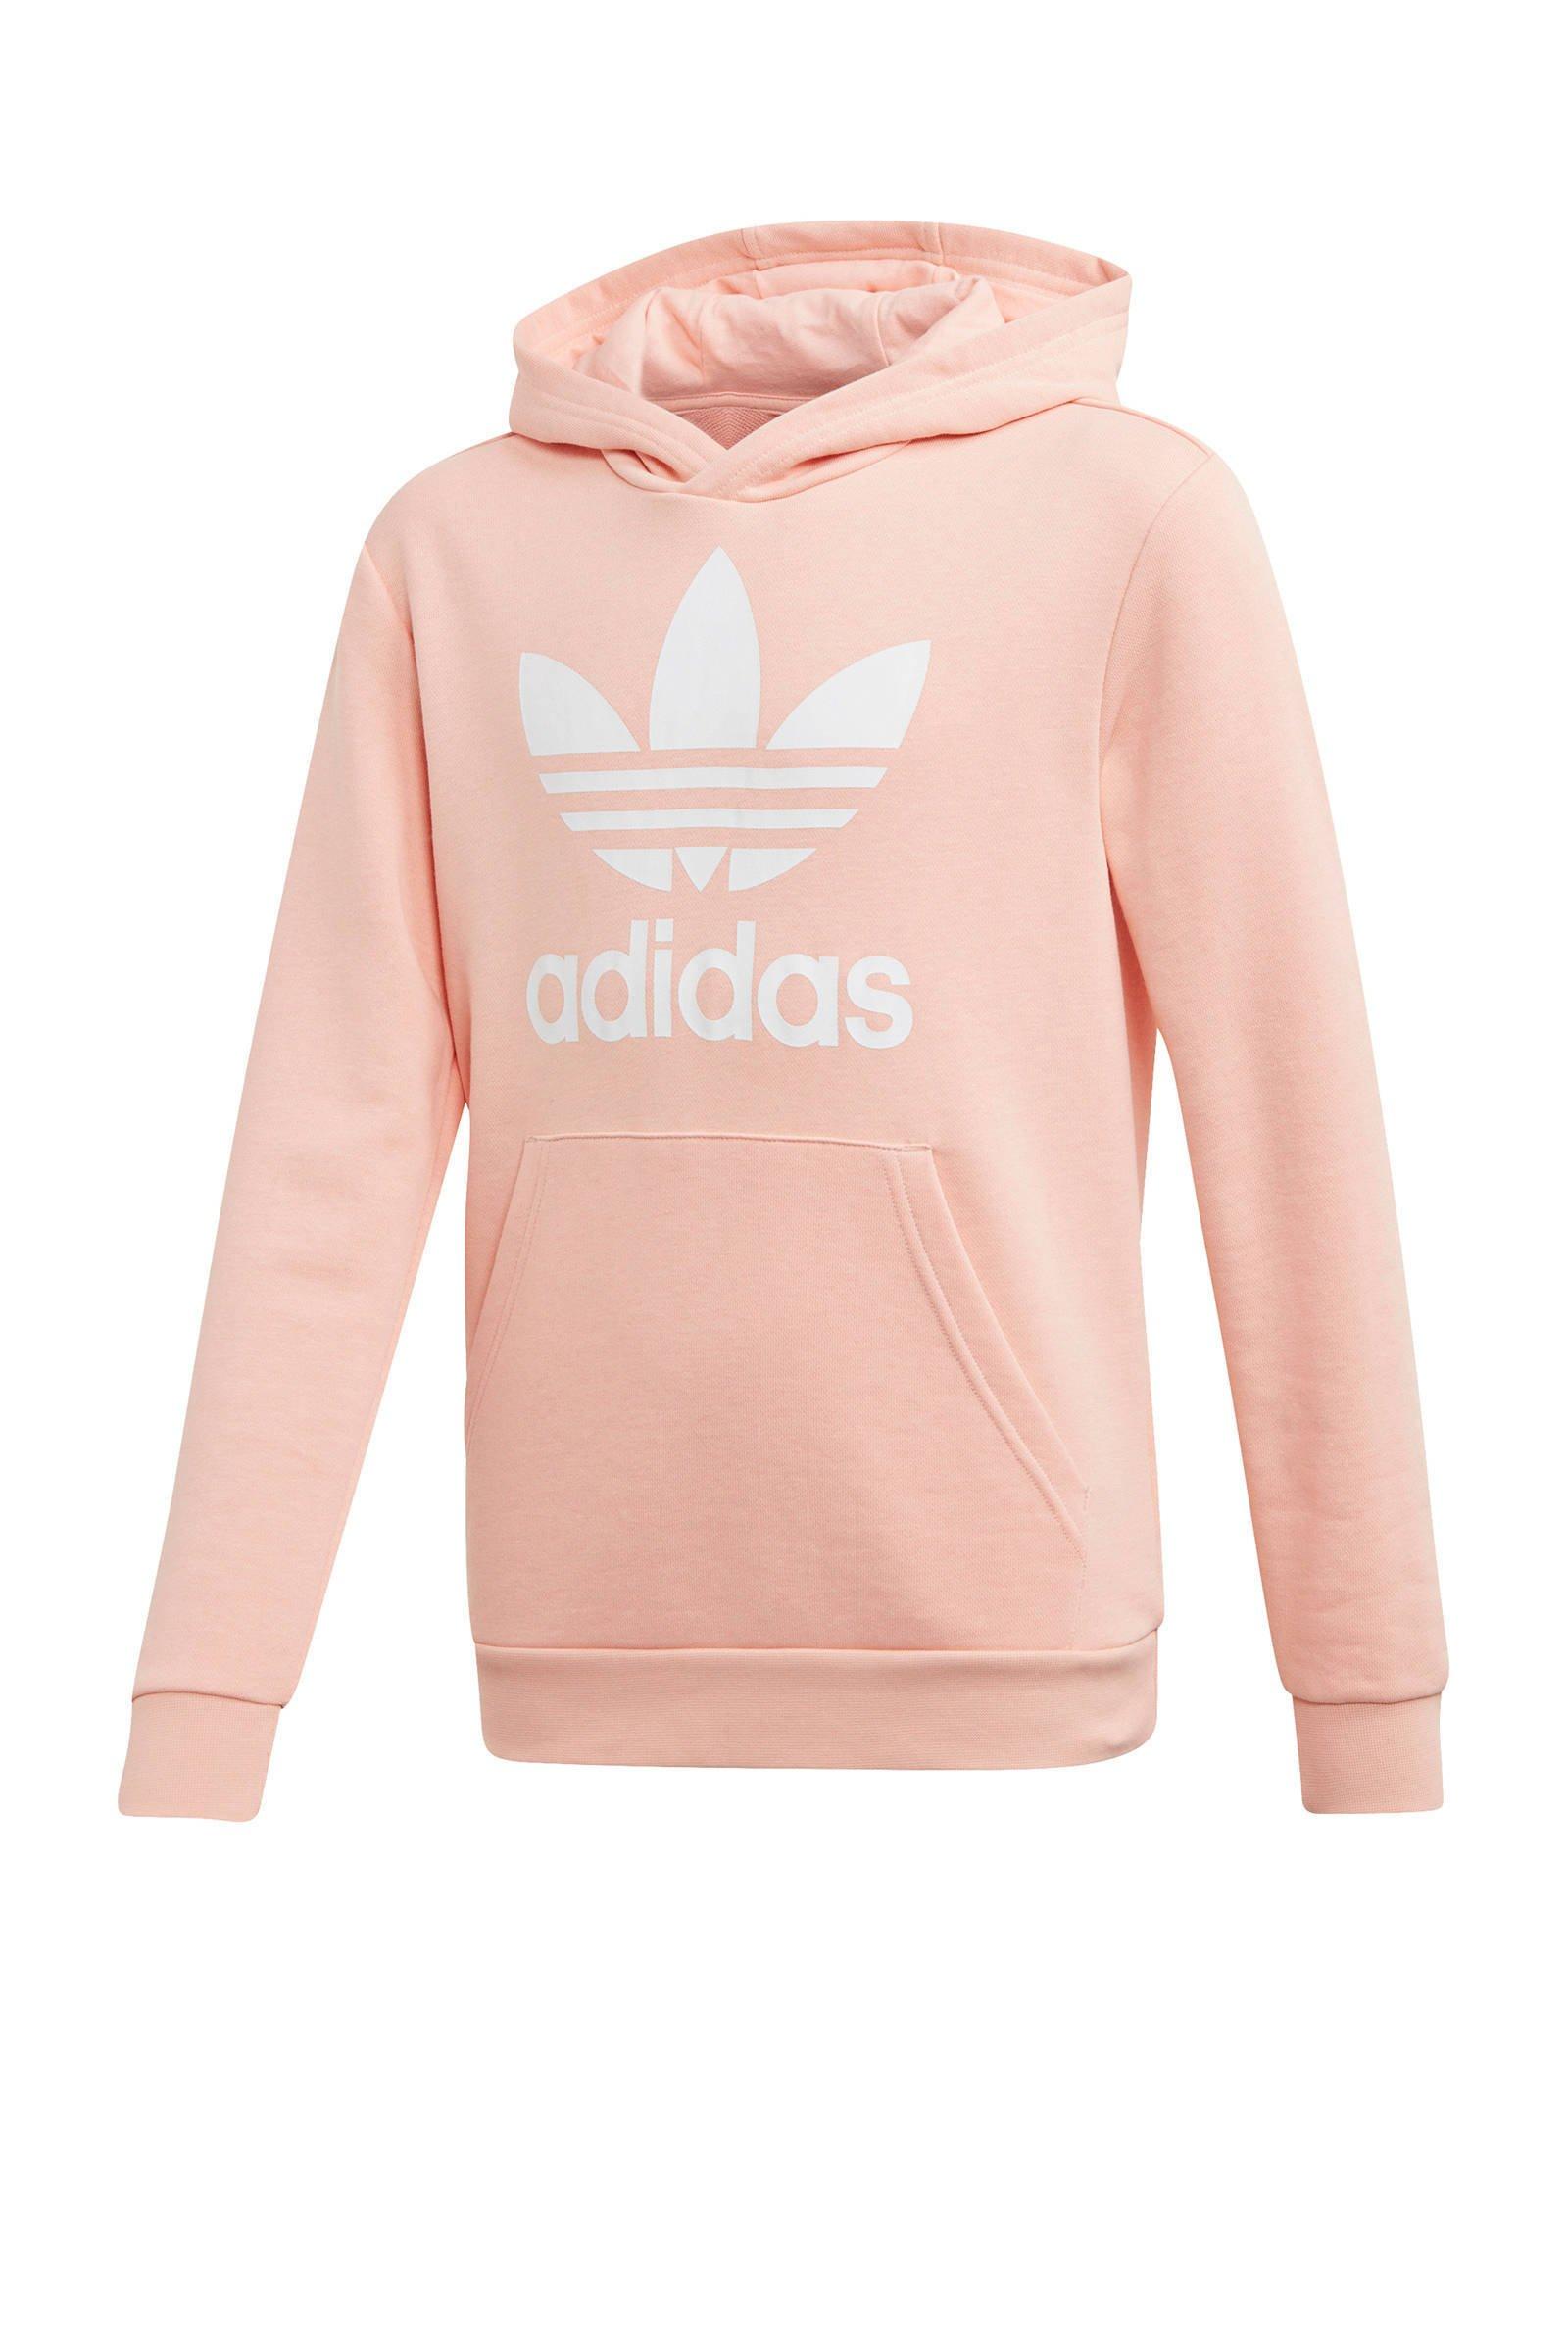 adidas Originals Adicolor hoodie roze   wehkamp